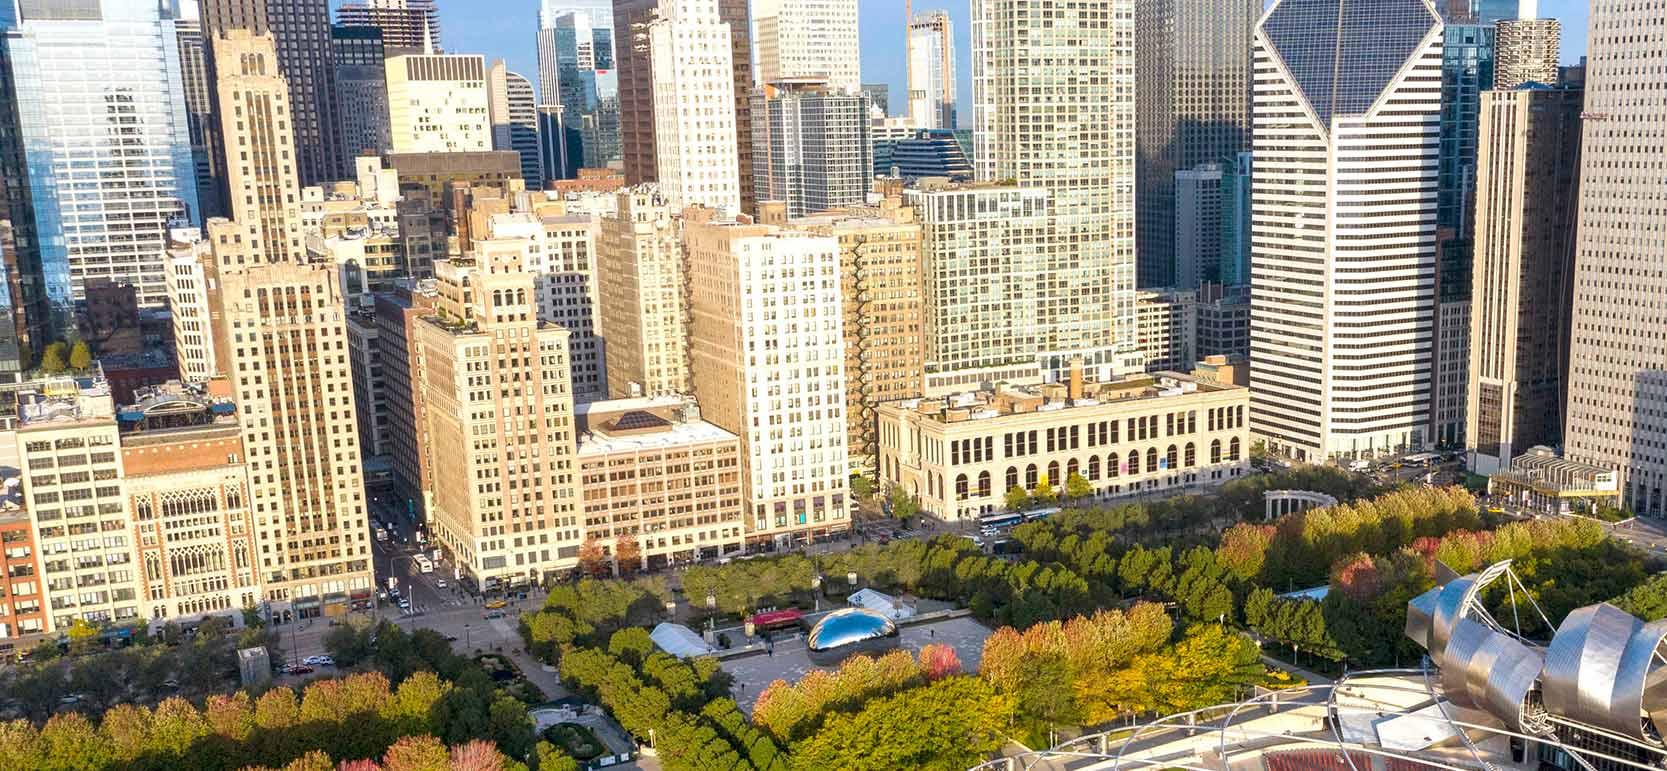 Aerial view of Millenium Park at sunset